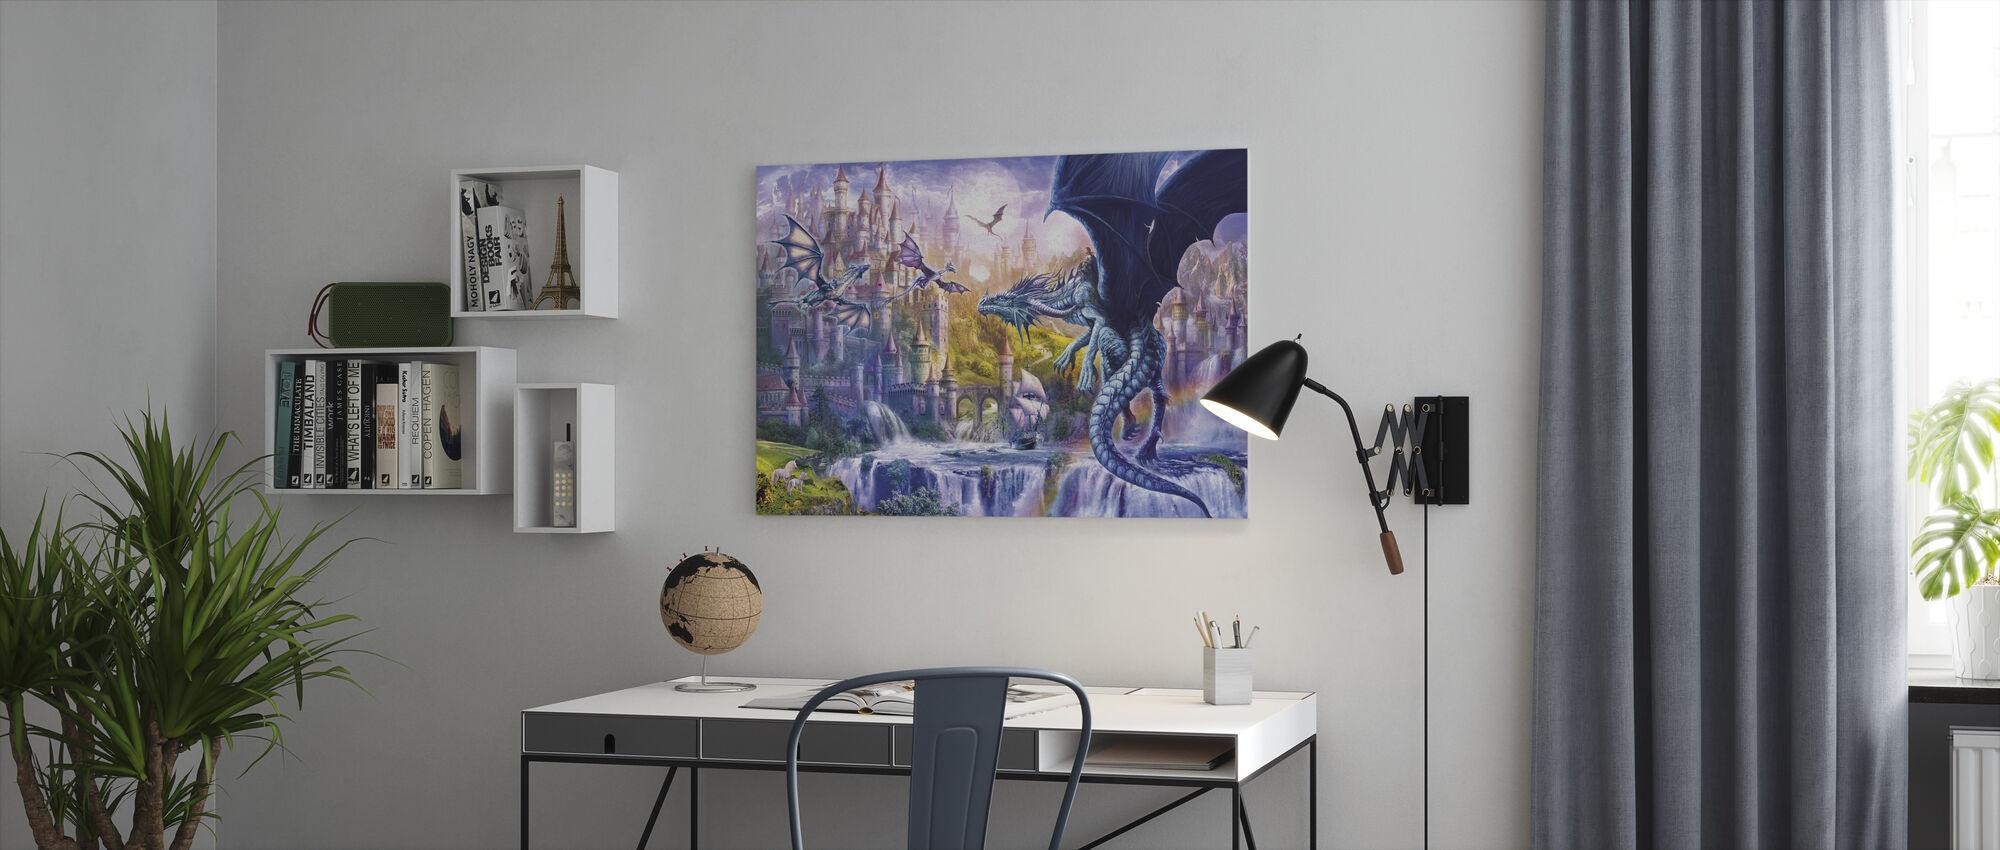 Dragon slott - Canvastavla - Kontor